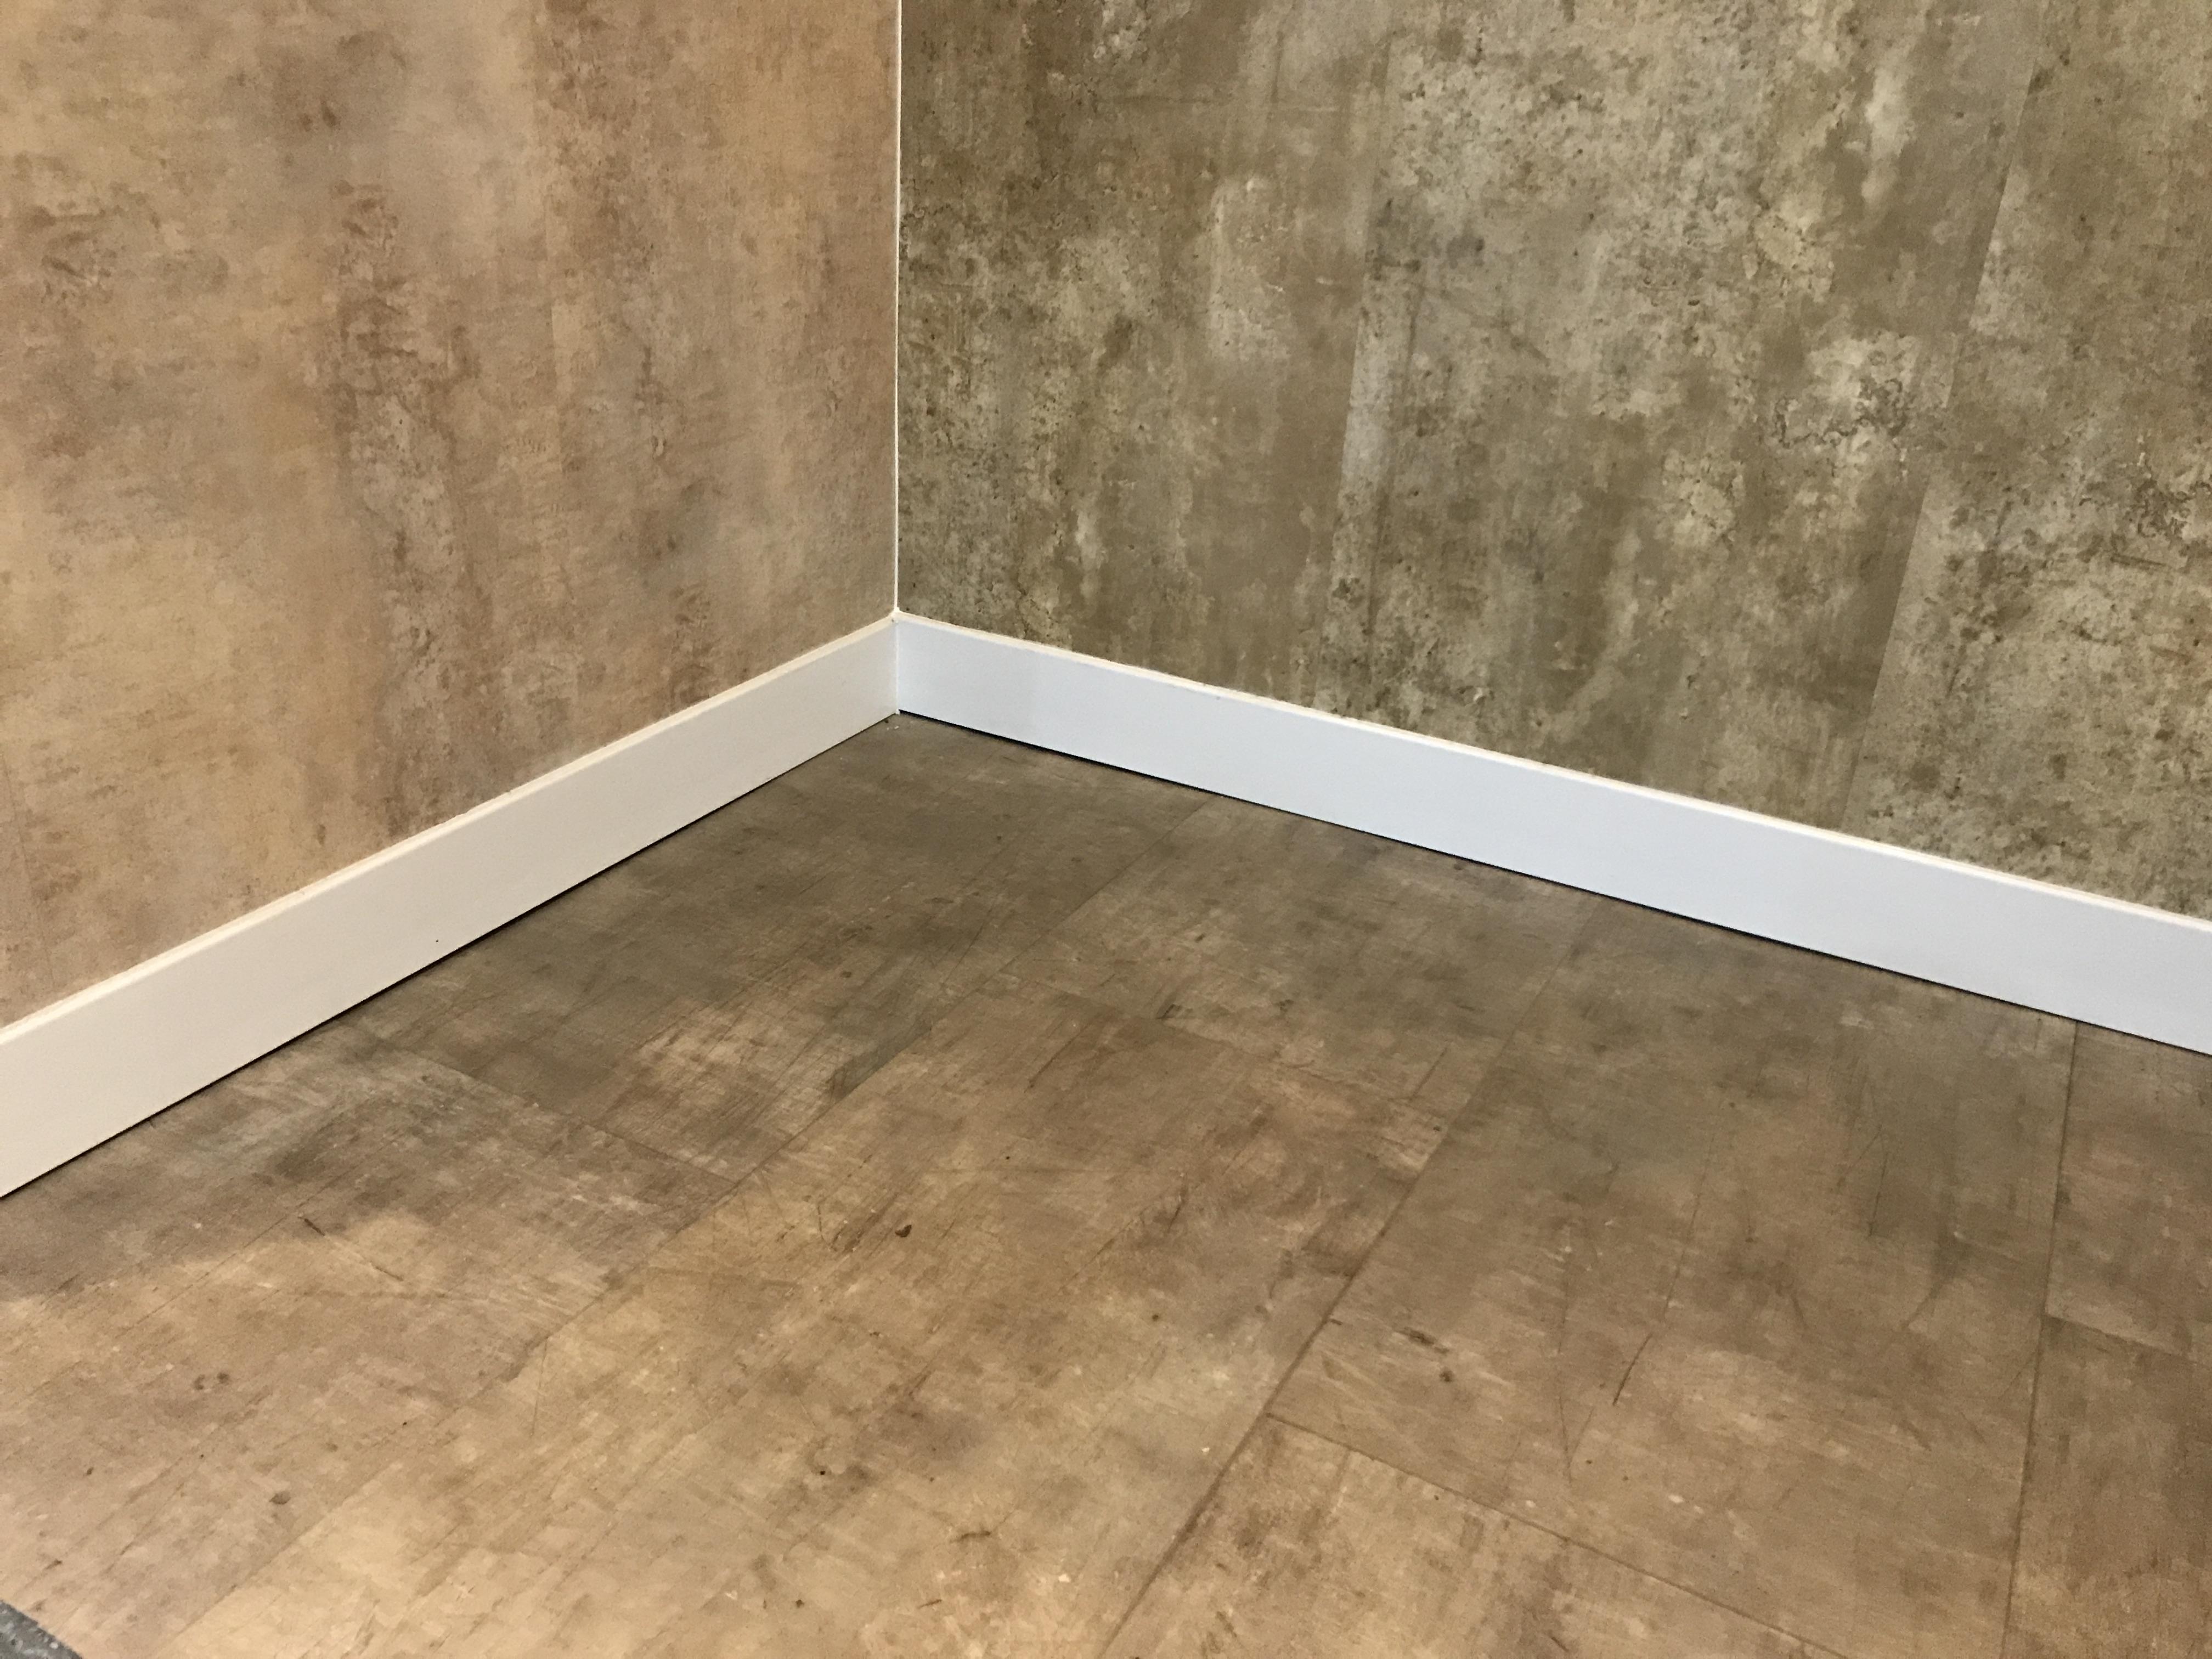 Skirting Trim - Bathroom Cladding Store